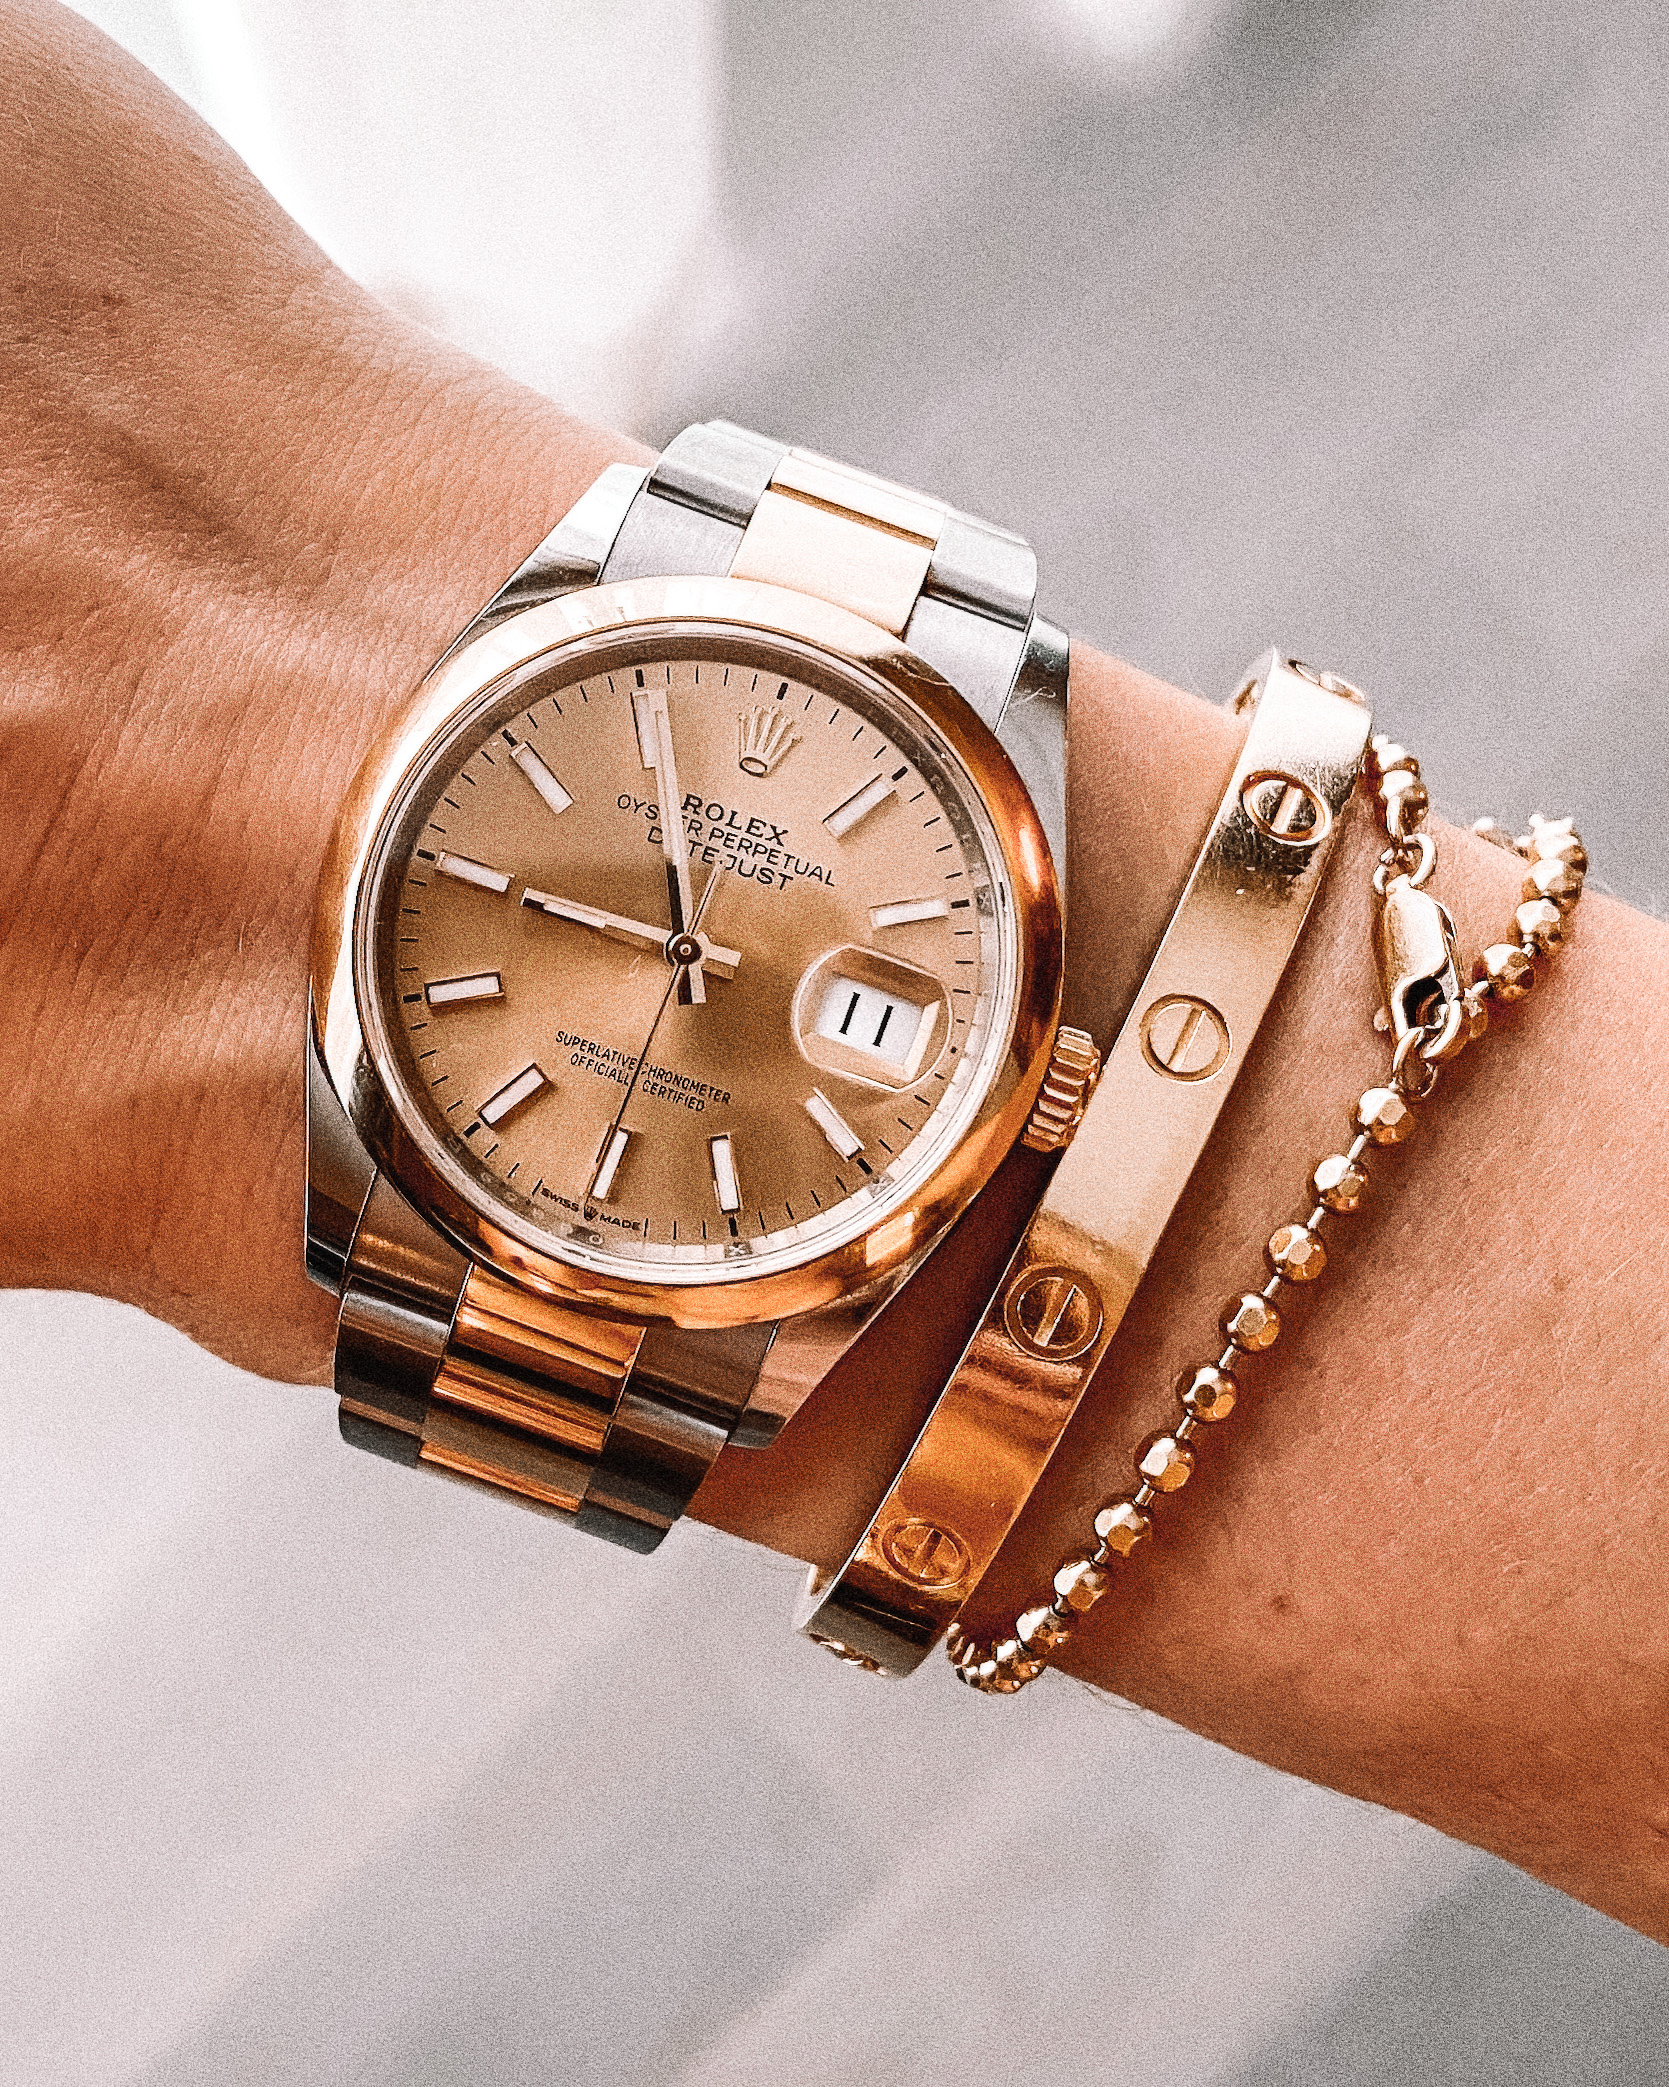 Fashion Jackson Rolex Oyster Perpetual Datejust 36 Gold Silve Cartier Love Bracelet Gold Miranda Frye Beaded Bracelet